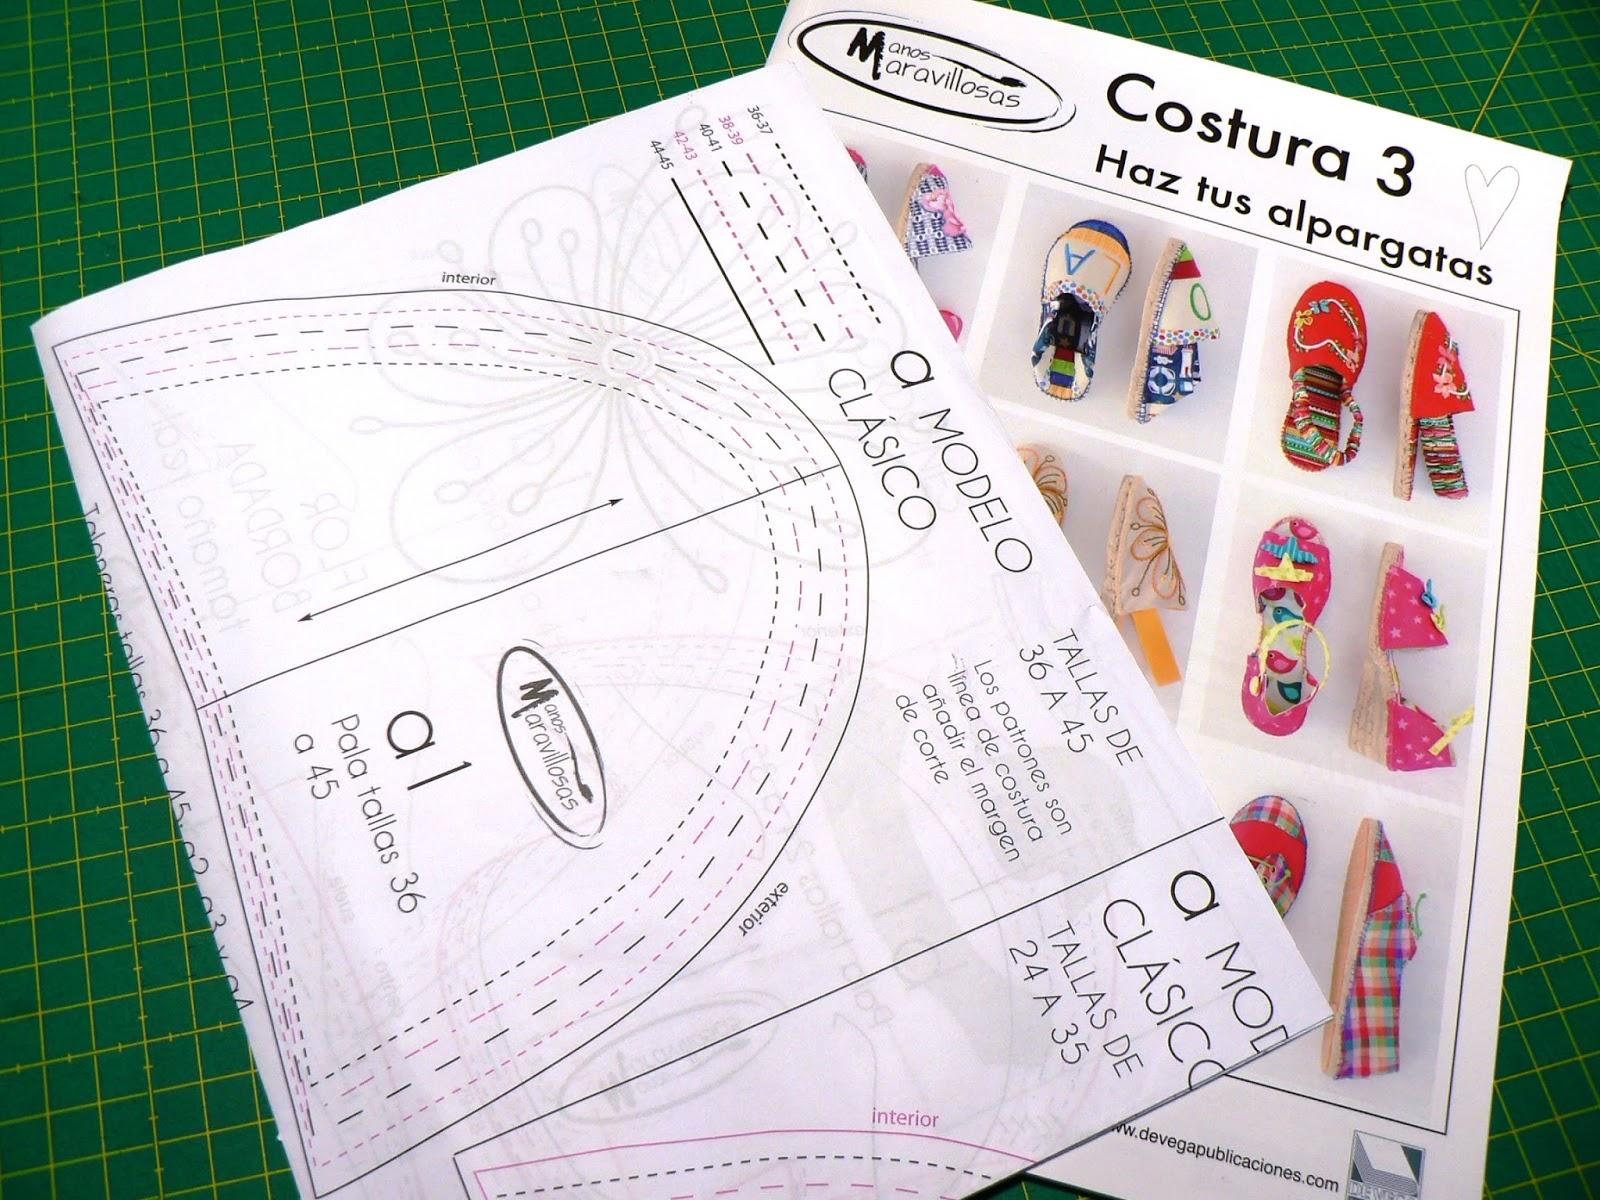 La costurera entrometida: Revistas de costura: Haz tus alpargatas